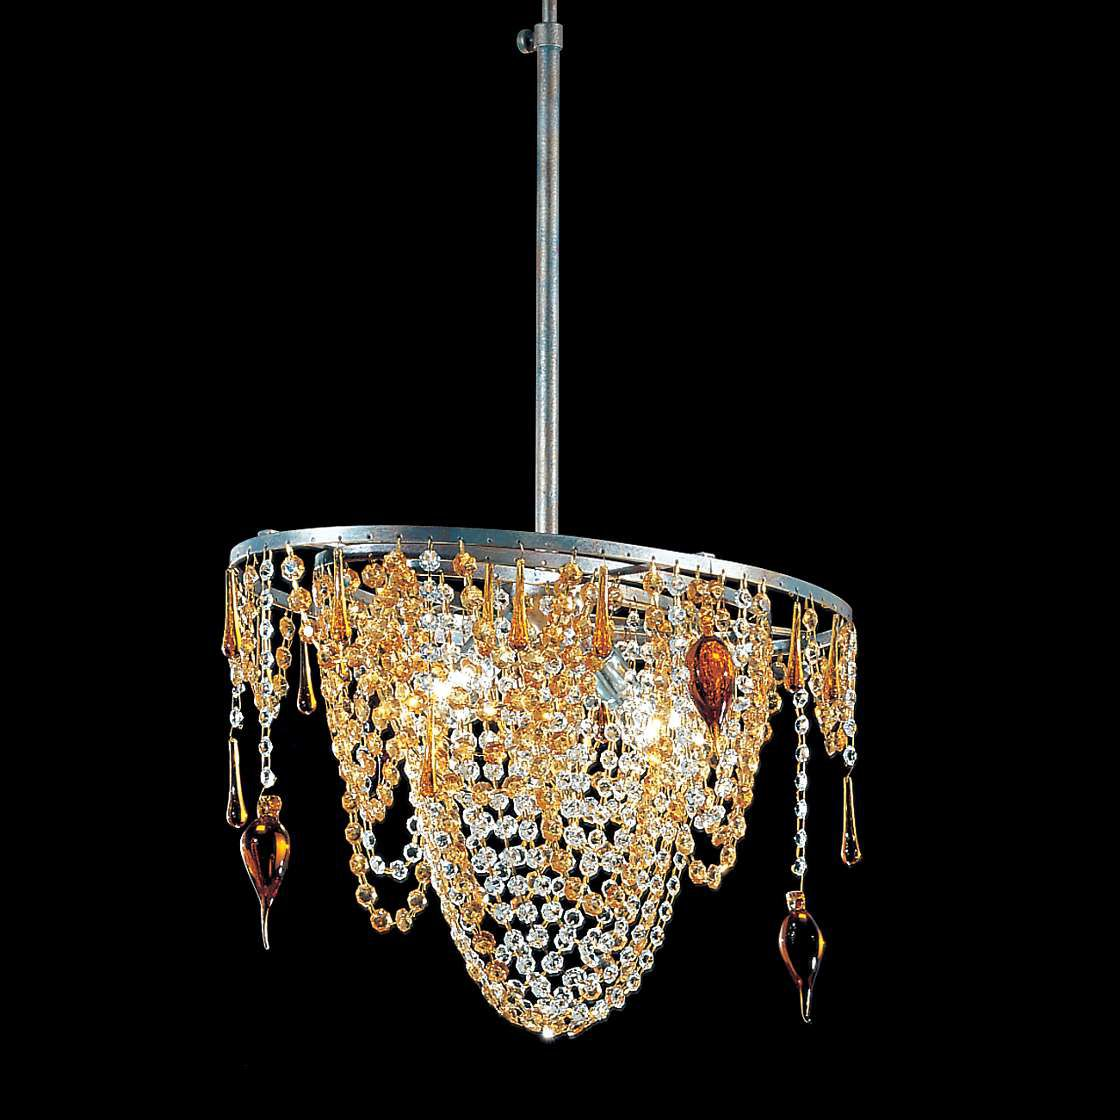 Pendelleuchte Golden Dream ● Metall/Kristall ● Silberblau ● 2-flammig- Hans Kögl A+